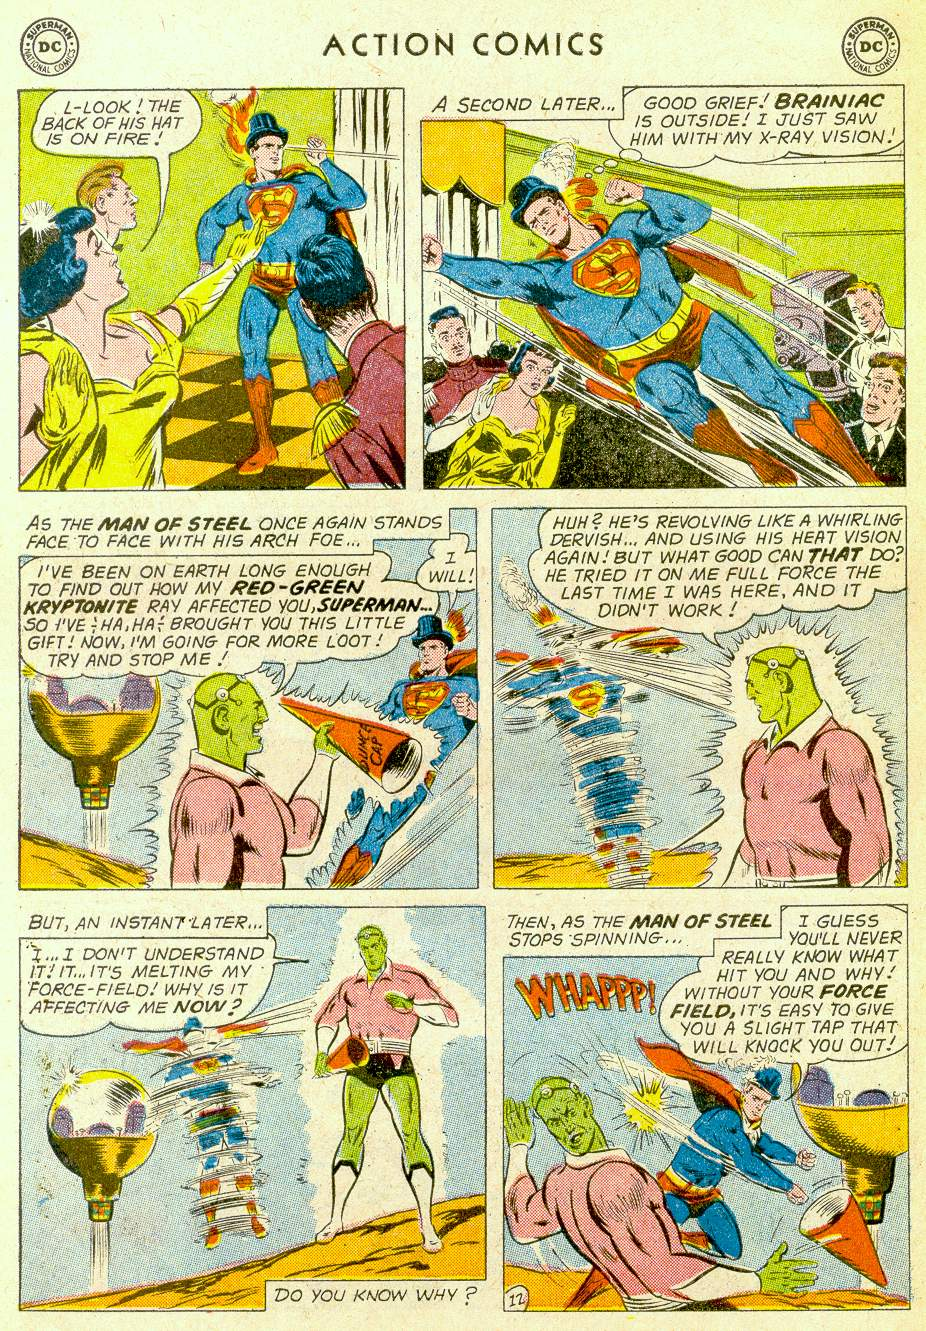 Action Comics (1938) 275 Page 13